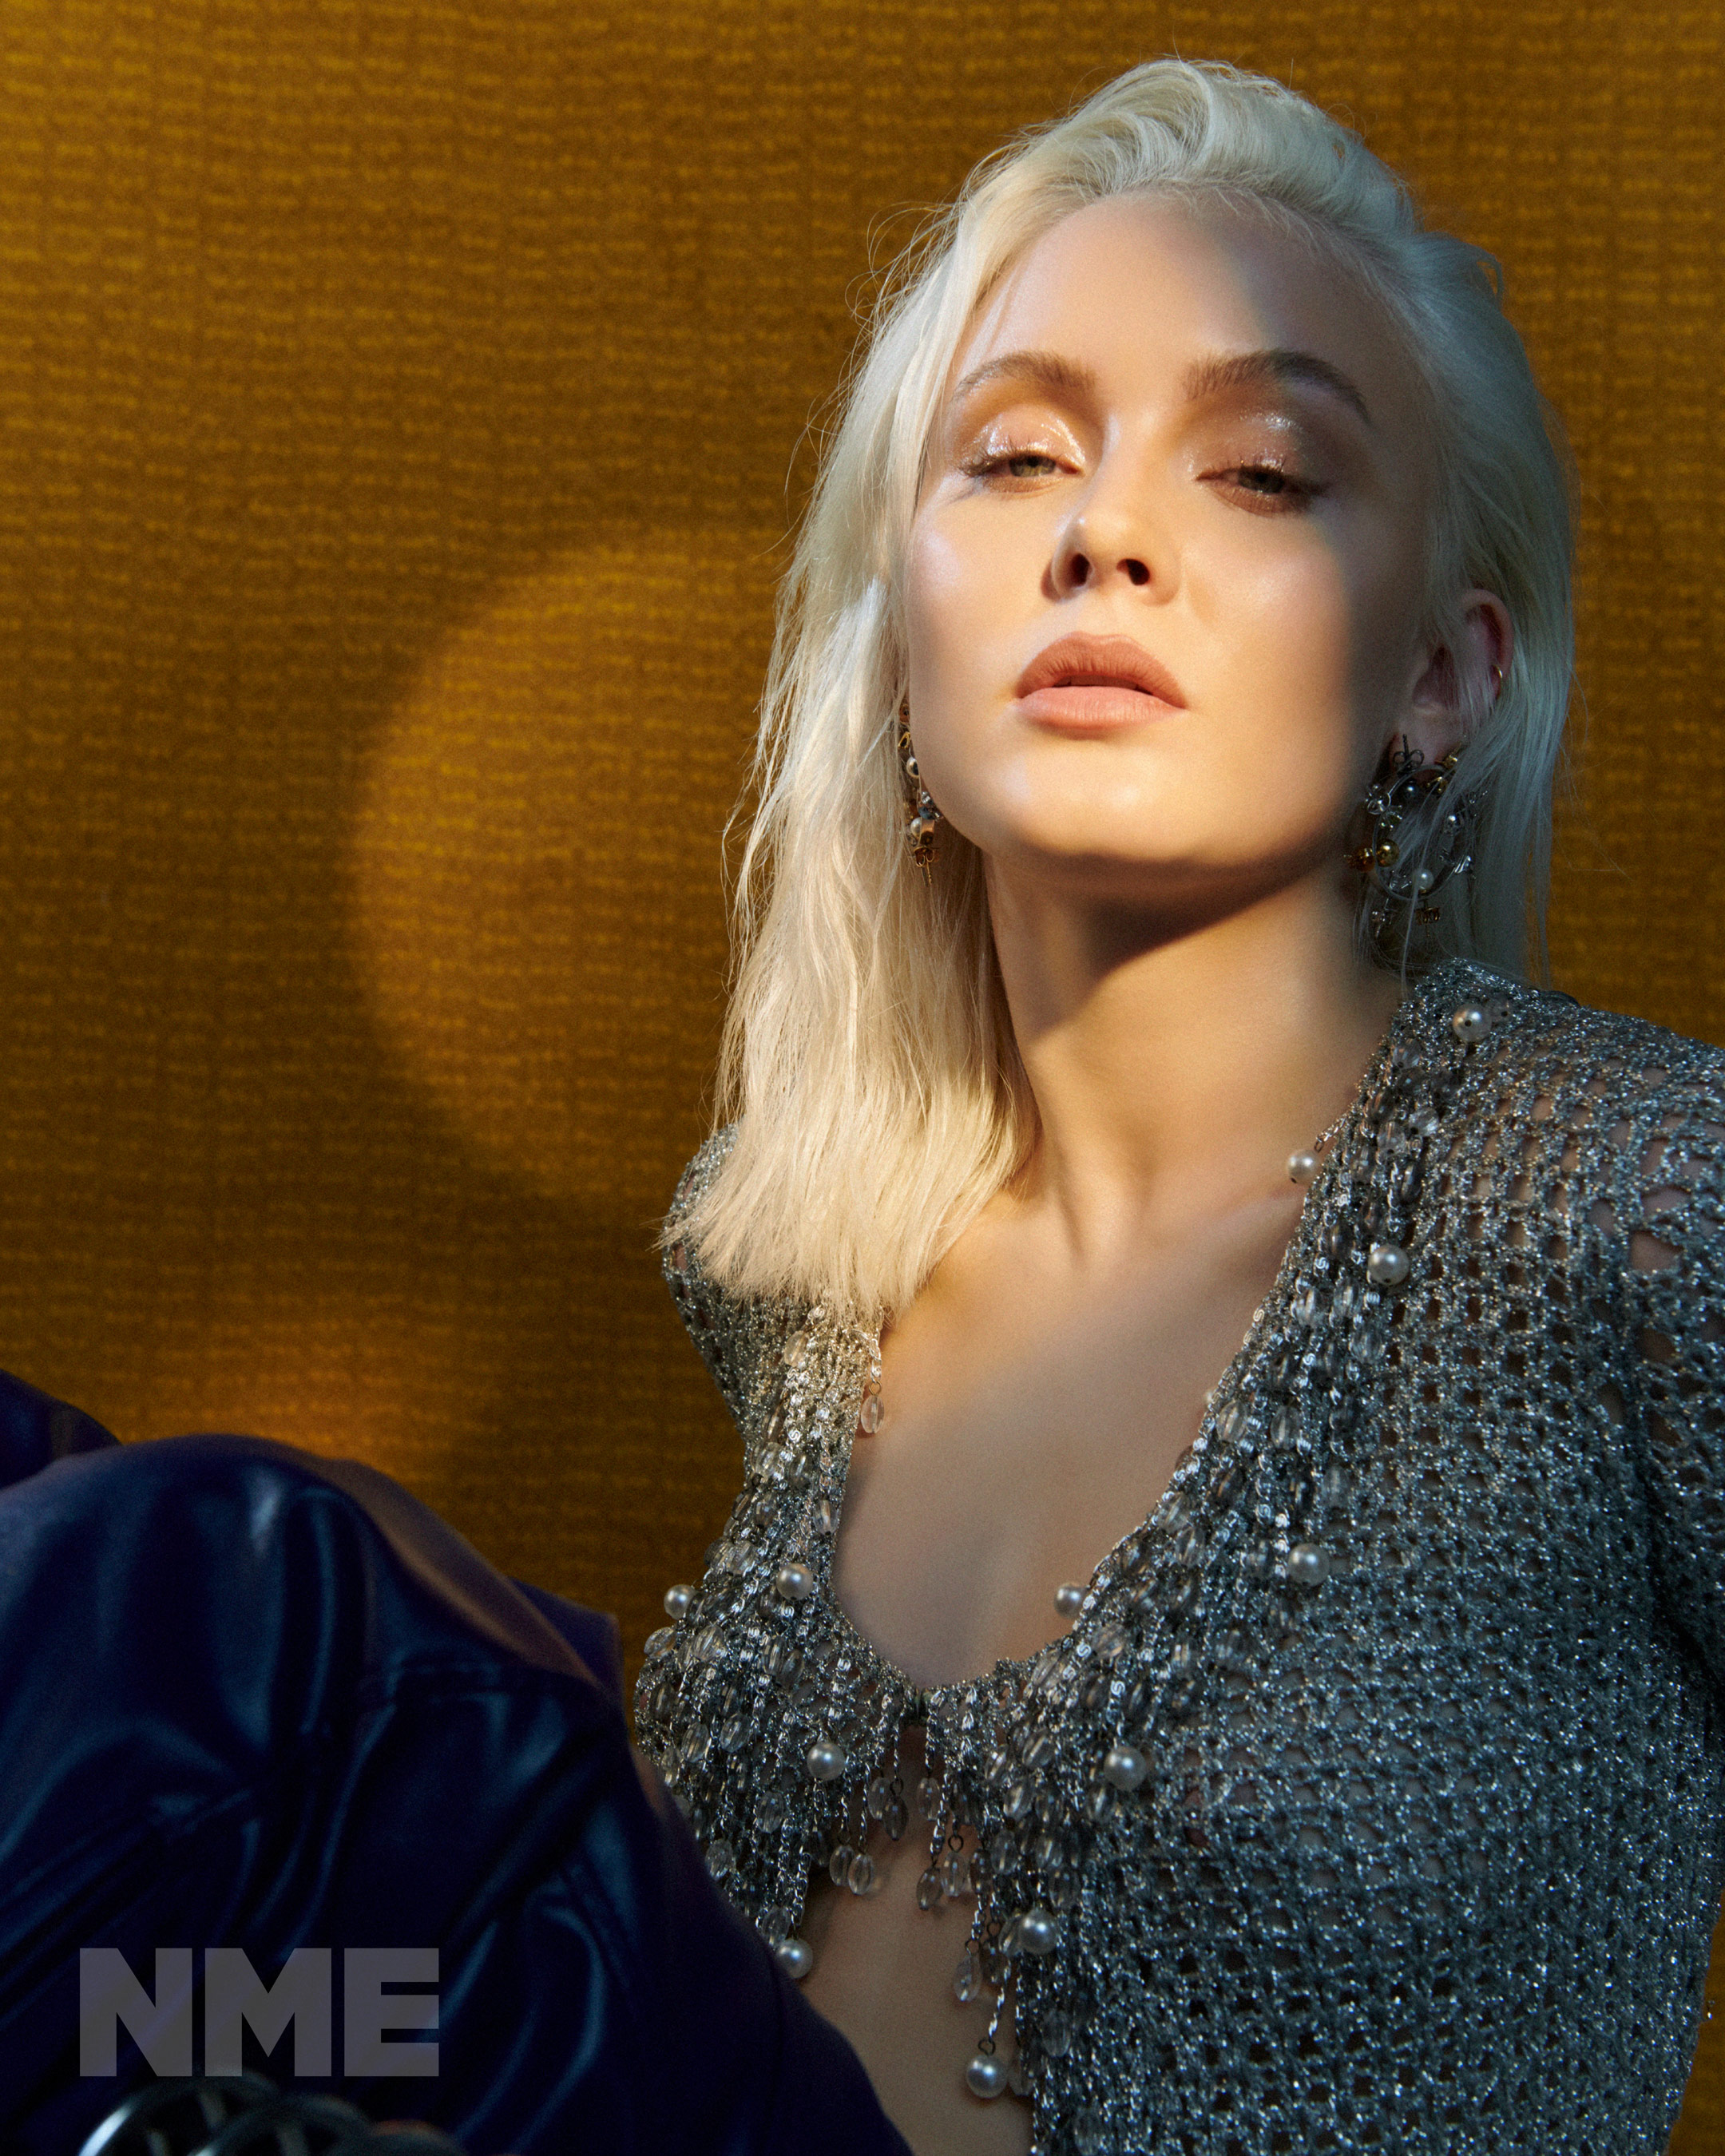 NME Cover 2021 Zara Larsson